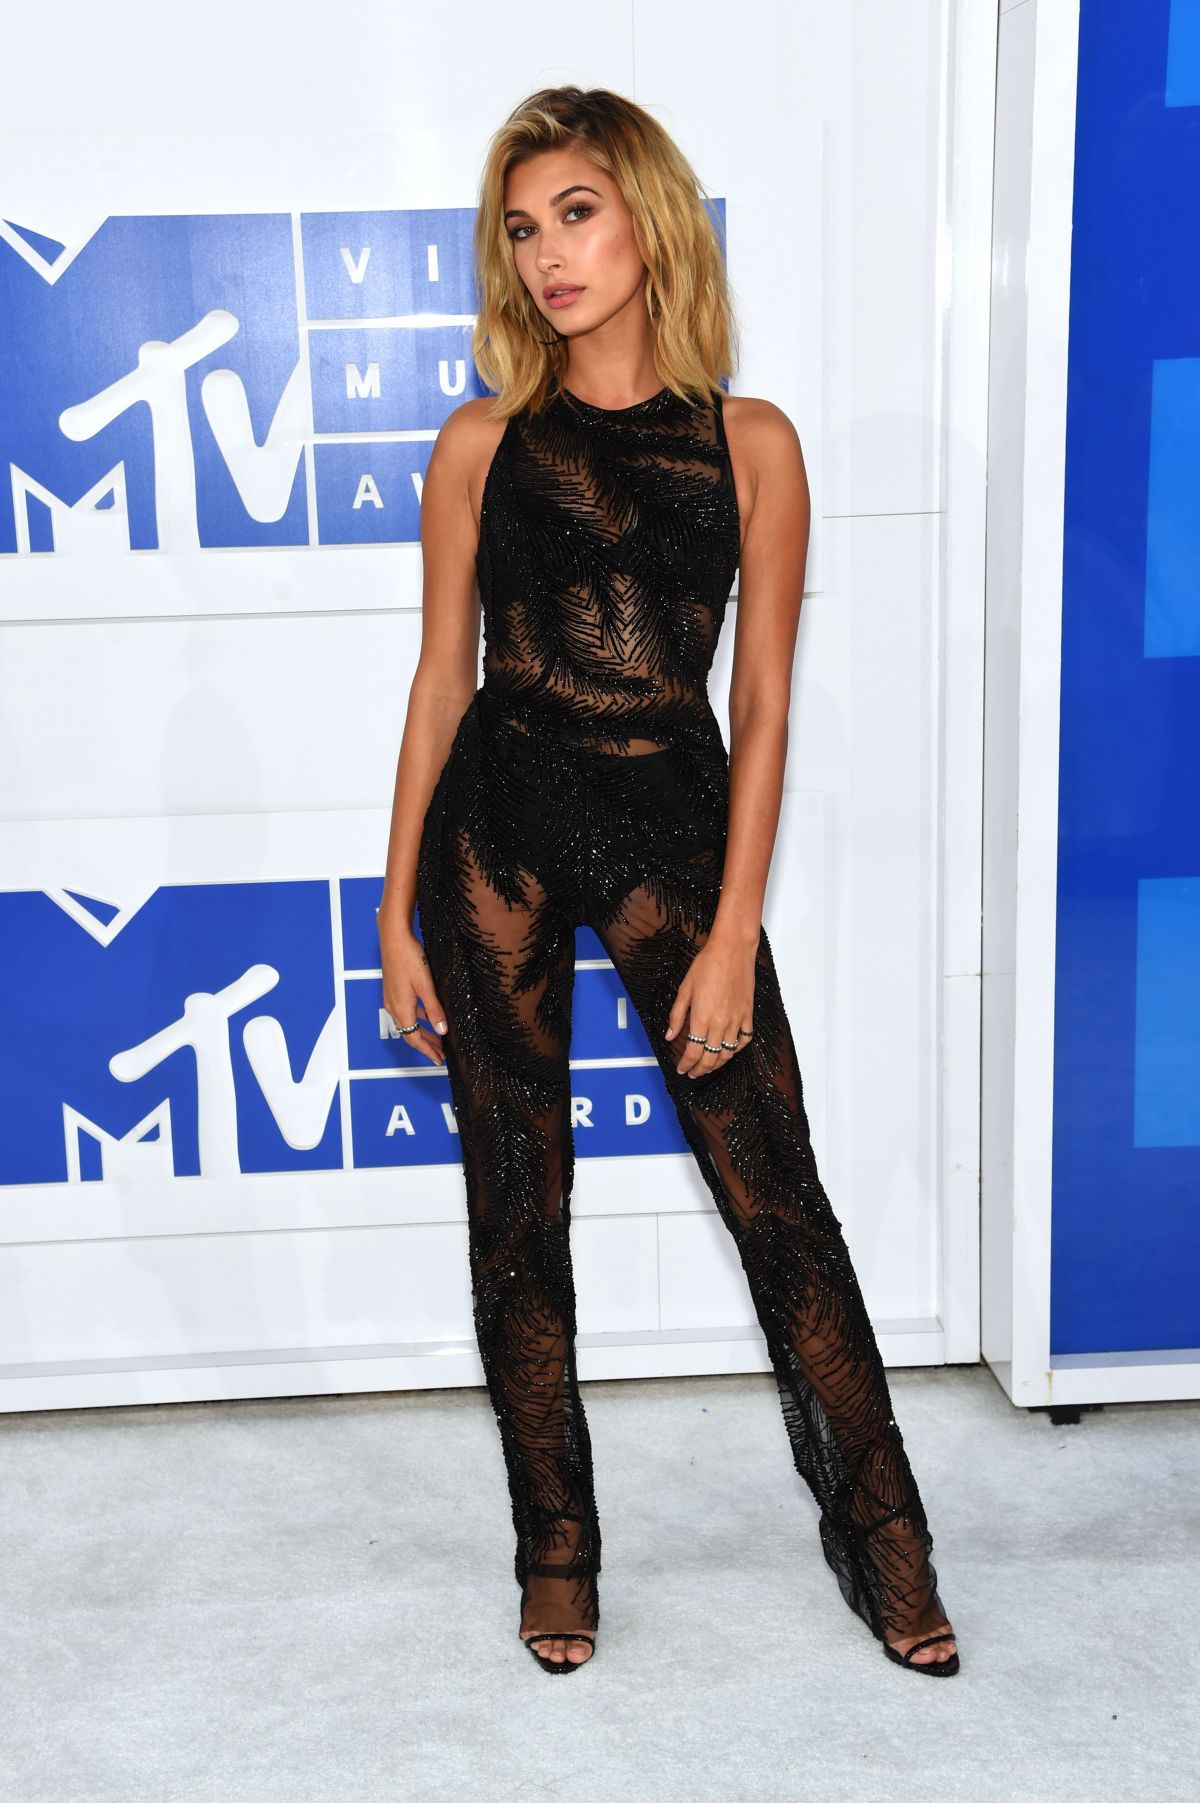 HAILEY BALDWIN at 2016 MTV Video Music Awards in New York 08/28/2016